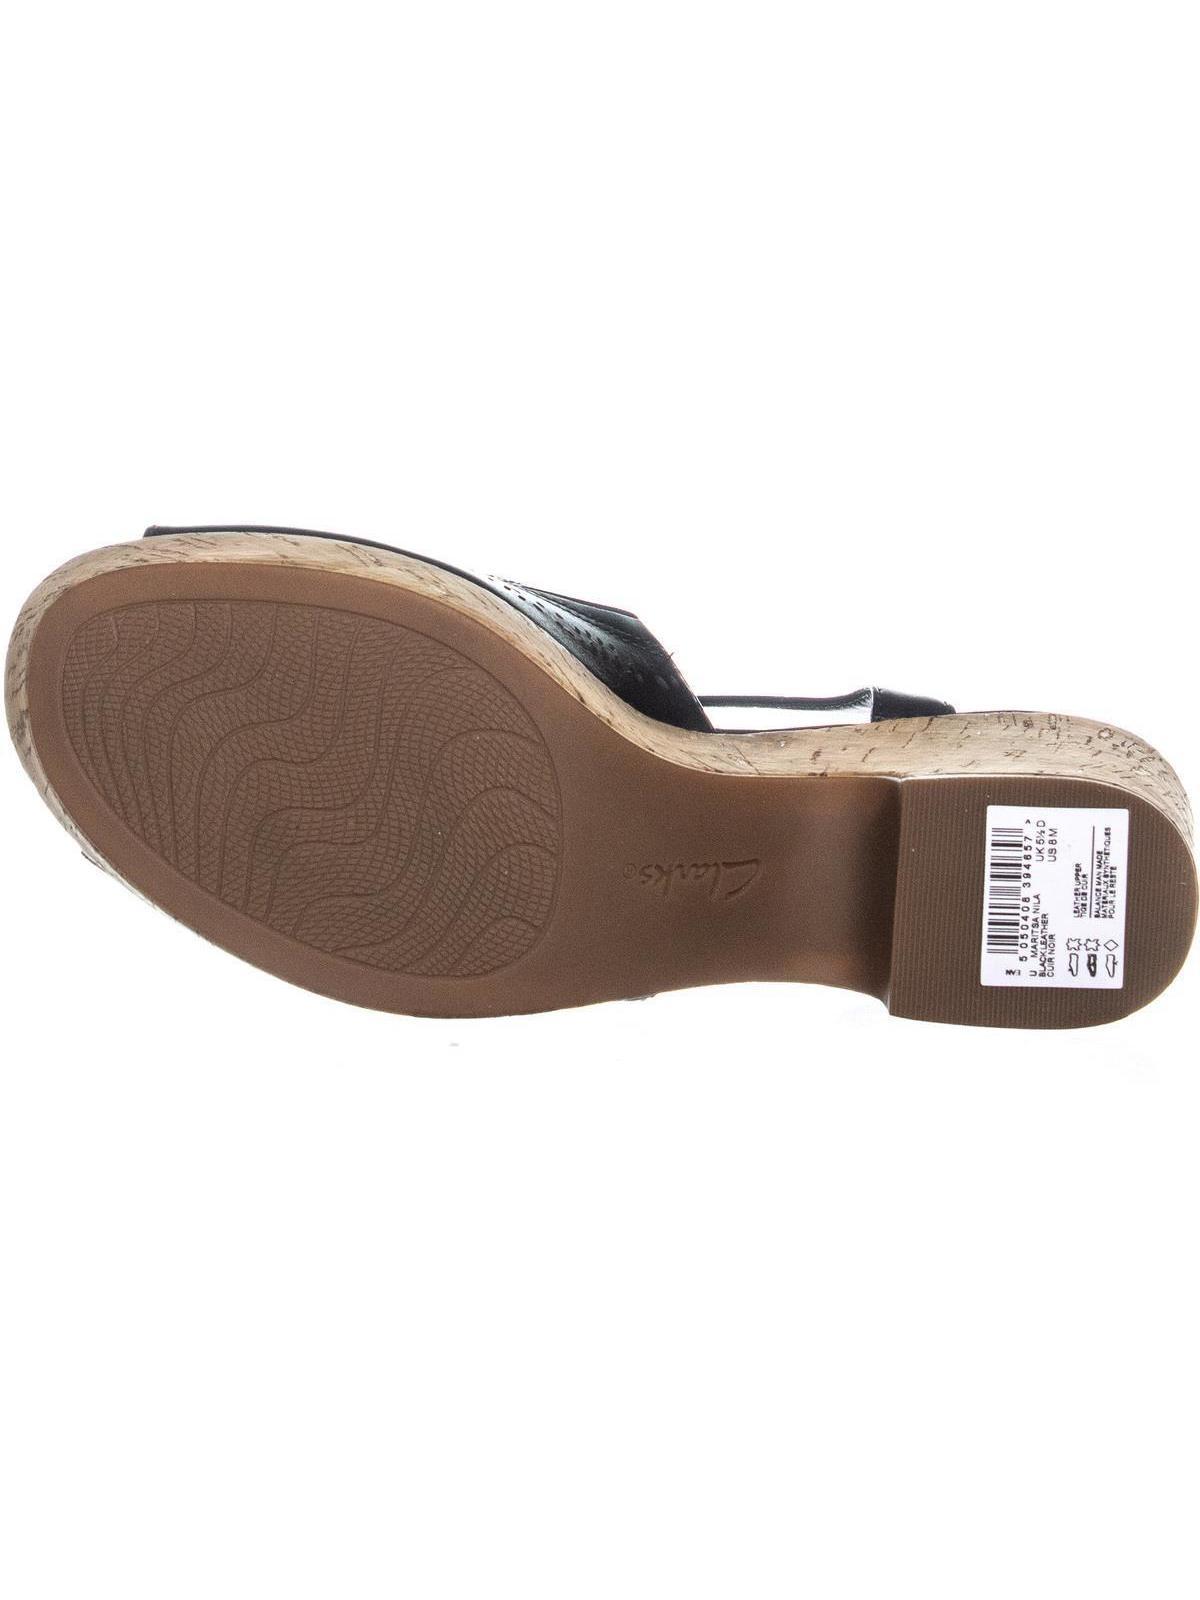 05dd08989f4 Clarks Maritsa Nila Perforated Peep Toe Sandals